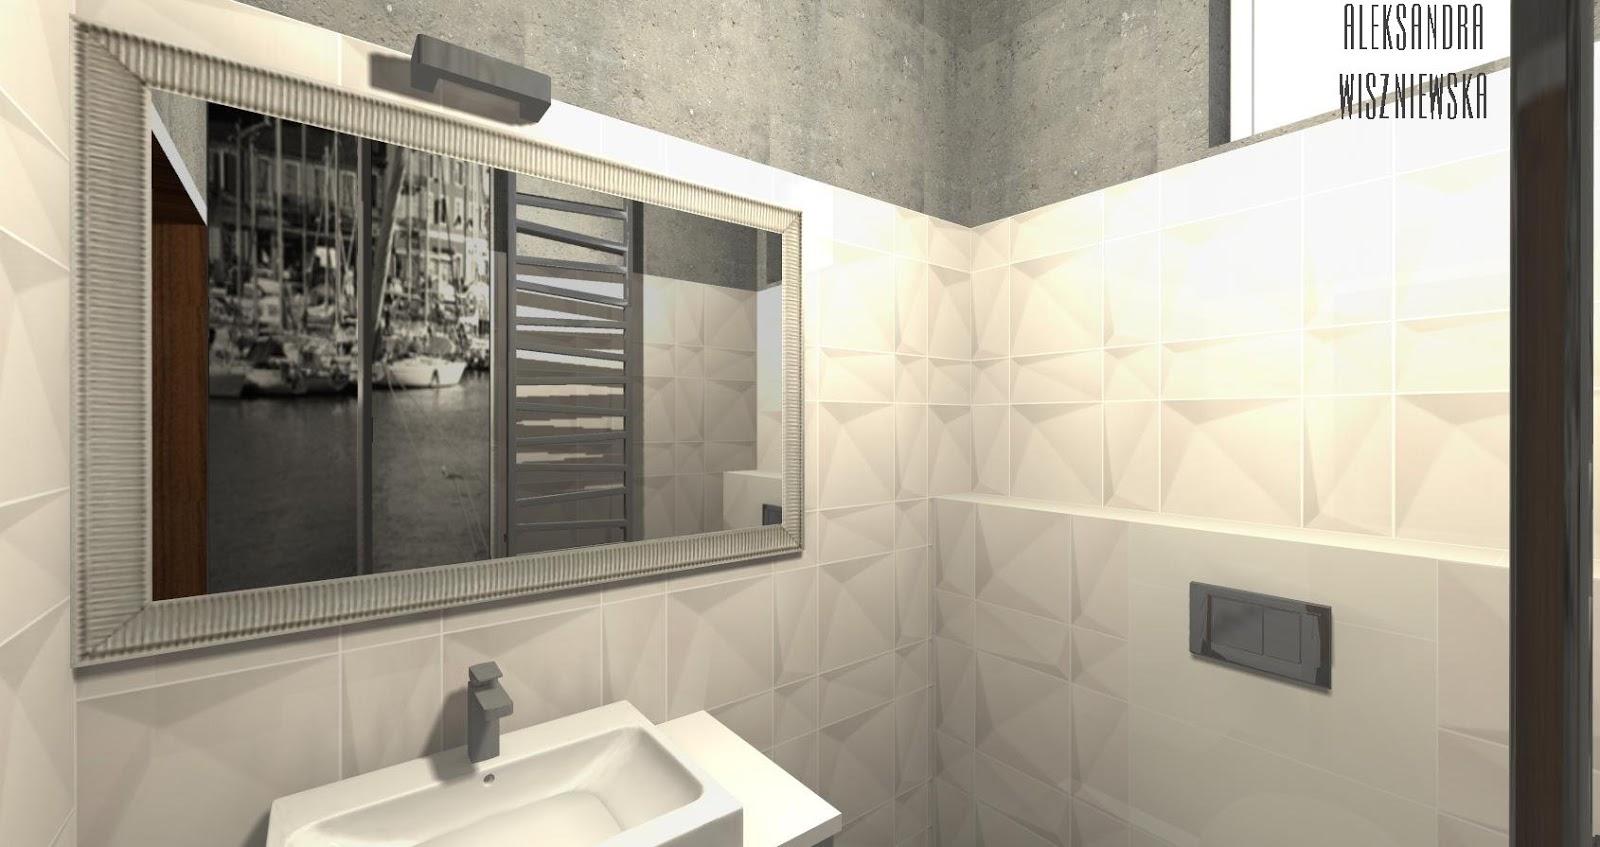 projekty azienek wizualizacje tub dzin maciej zie berlin tegel weiss parady tecniq nero. Black Bedroom Furniture Sets. Home Design Ideas